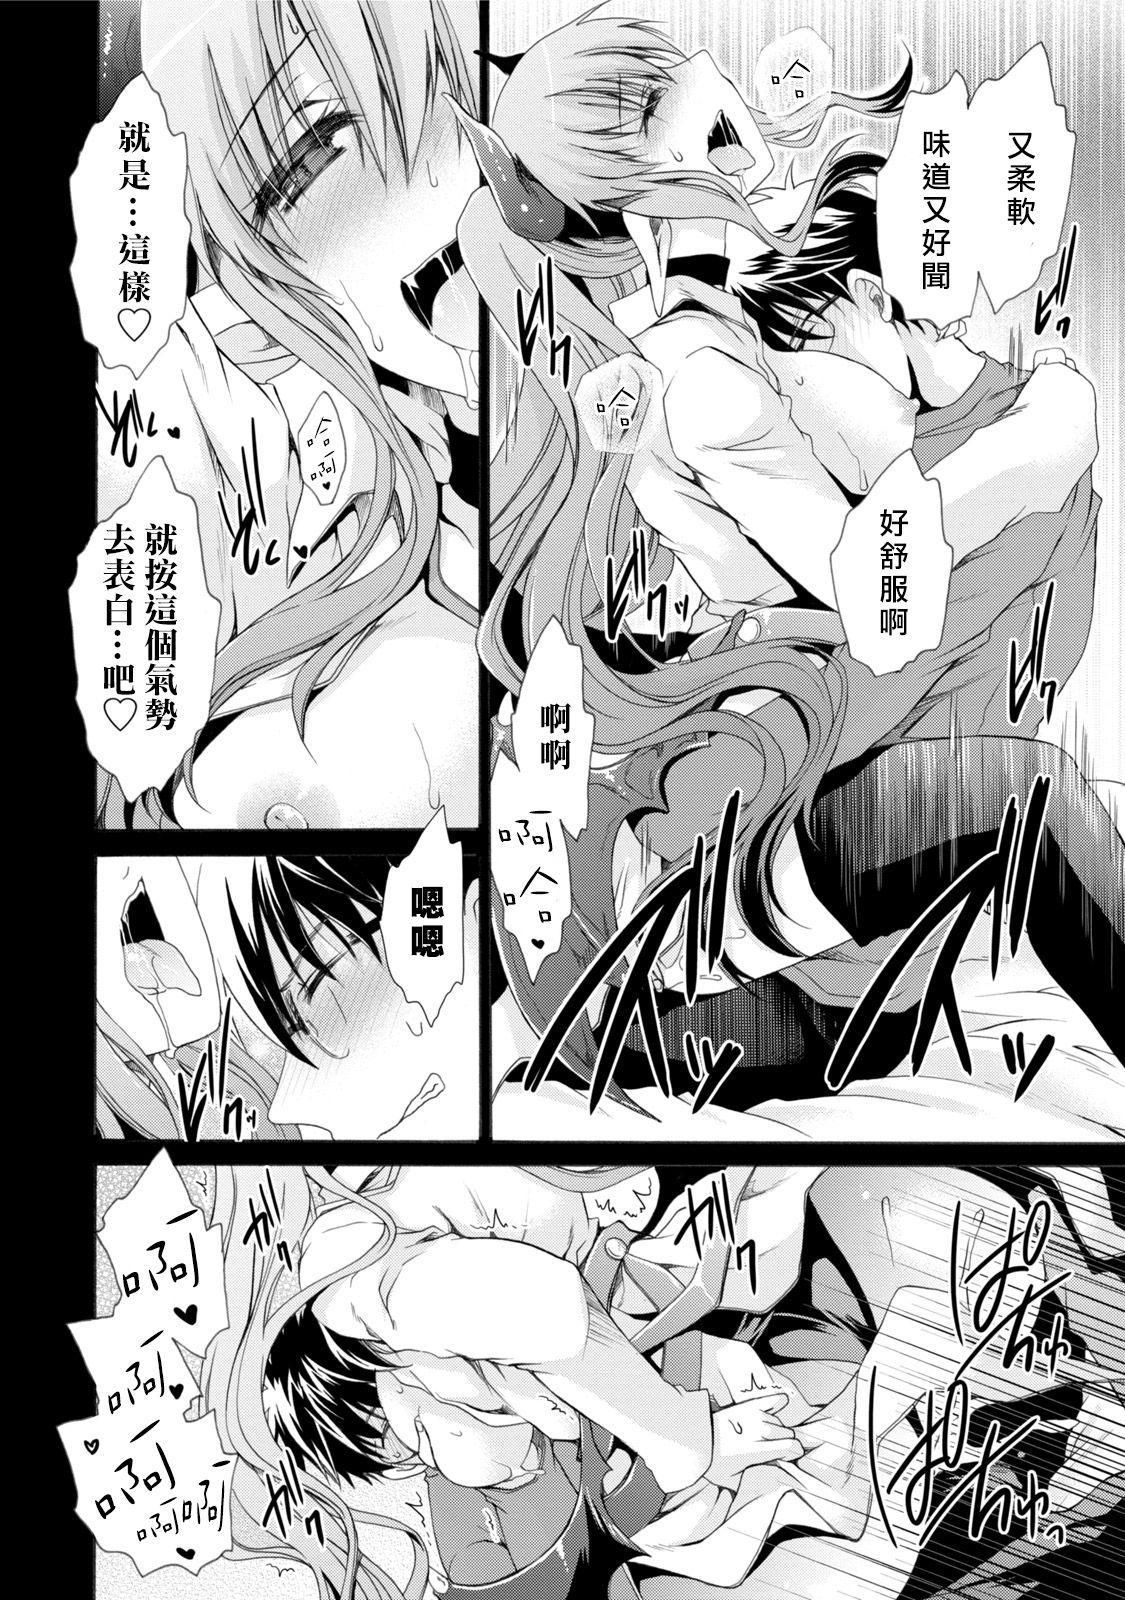 [Shinonome Ryu] Ore to Kanojo to Owaru Sekai - World's end LoveStory ch.1-9 [Chinese] [爱弹幕汉化组] [Digital] 21